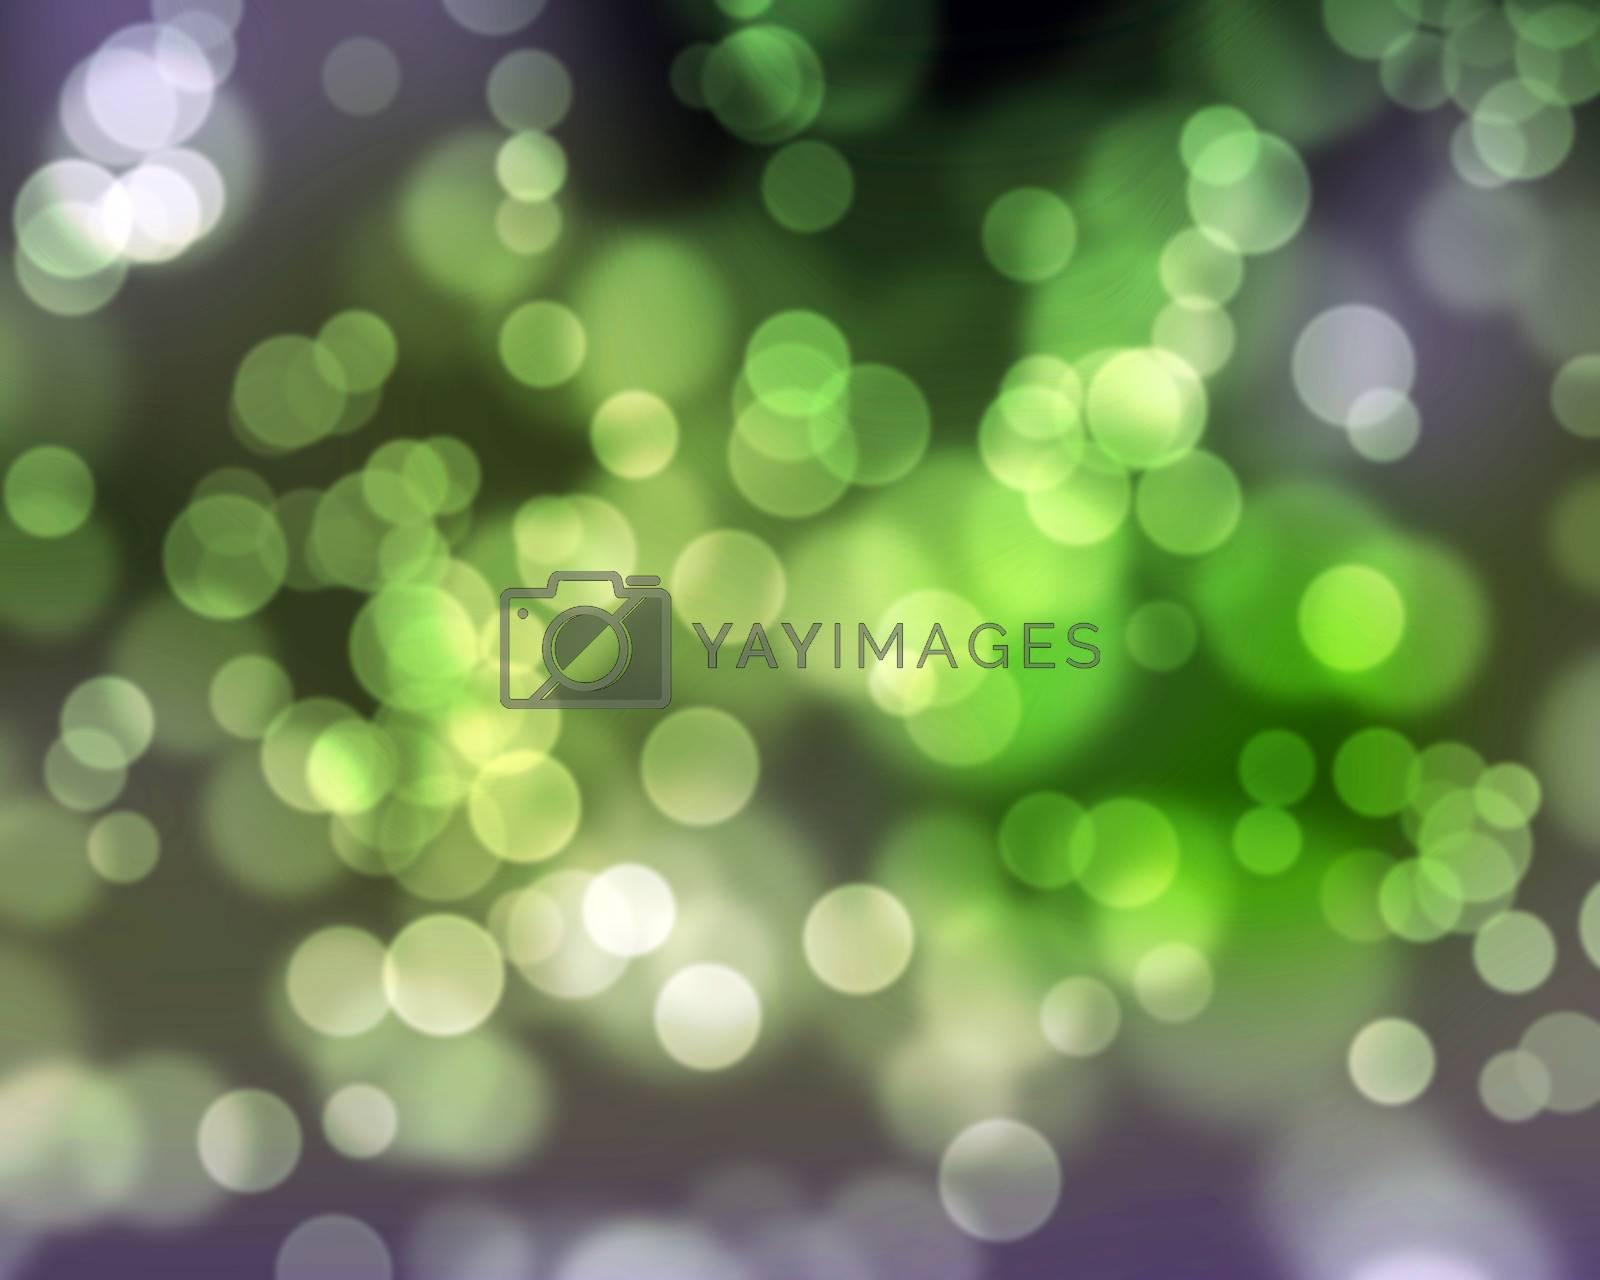 colorful dots background illustration